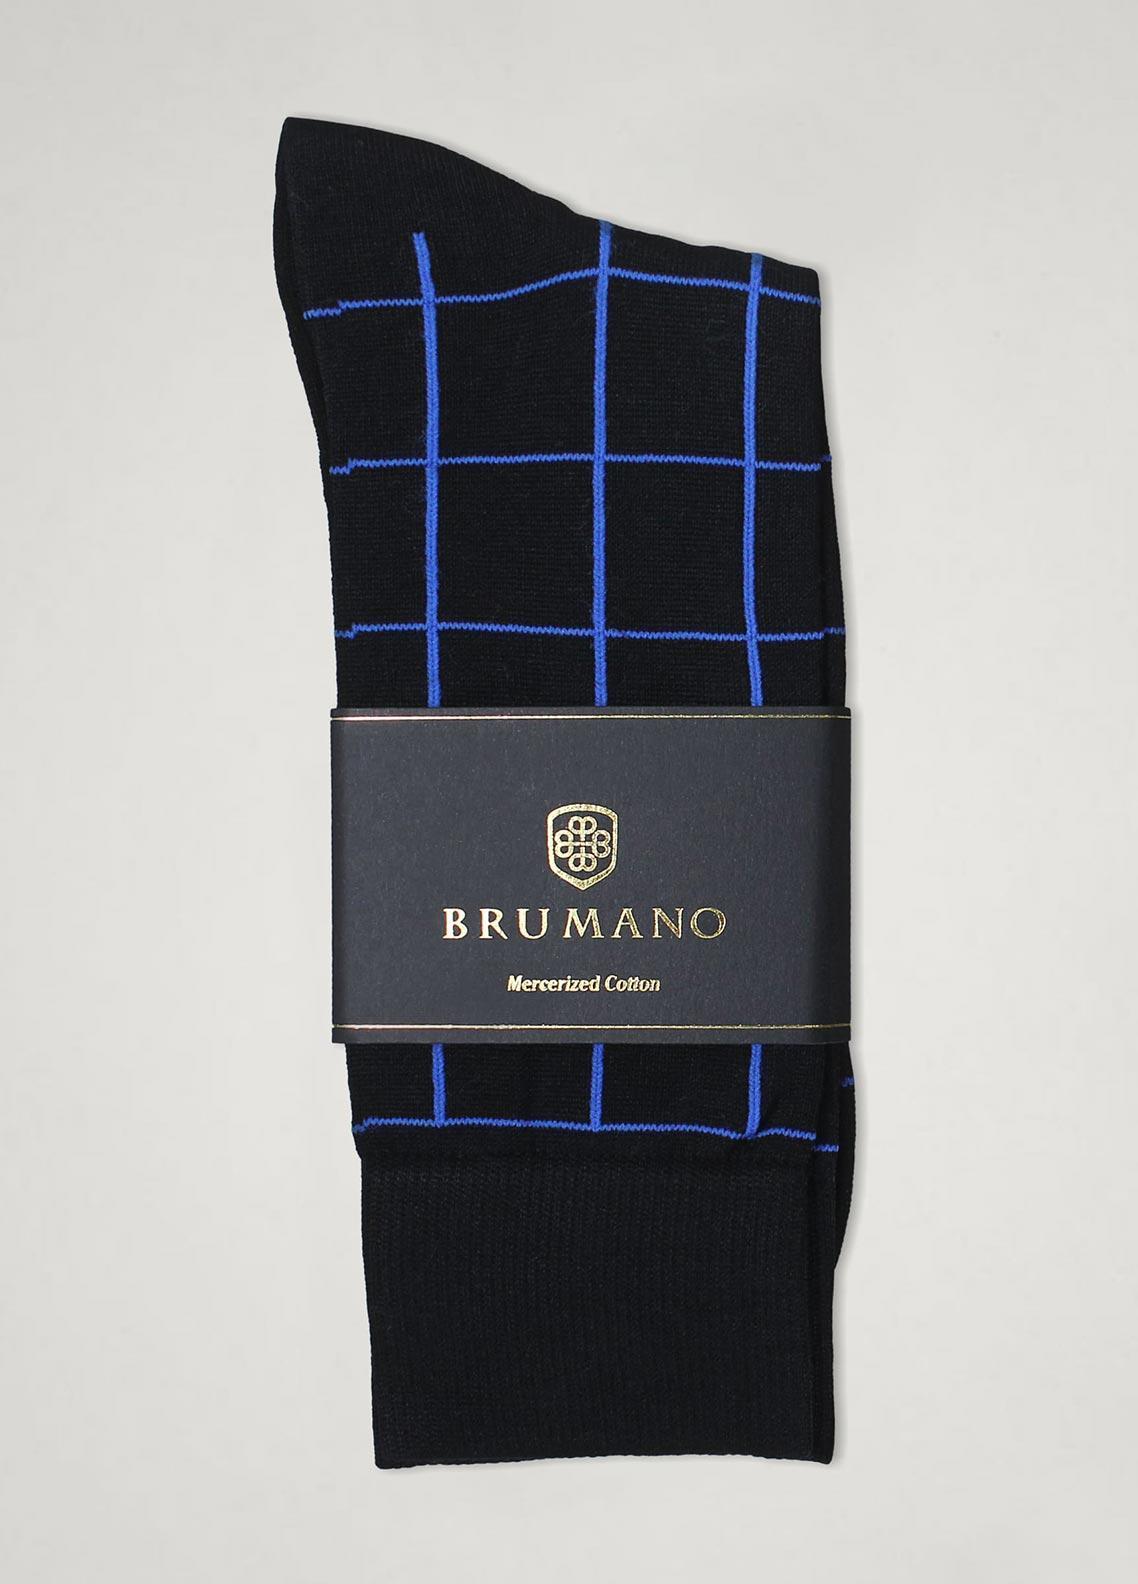 Brumano Cotton Socks SKS-025